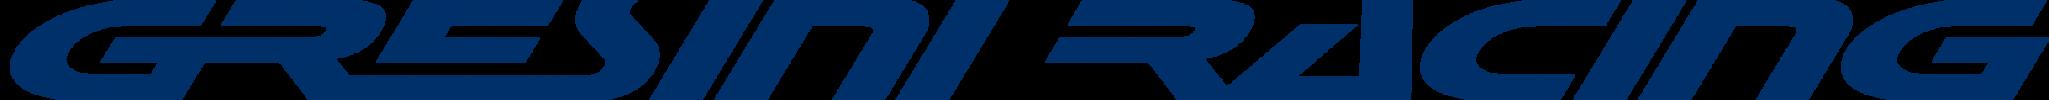 Logo-Gresini-Racing